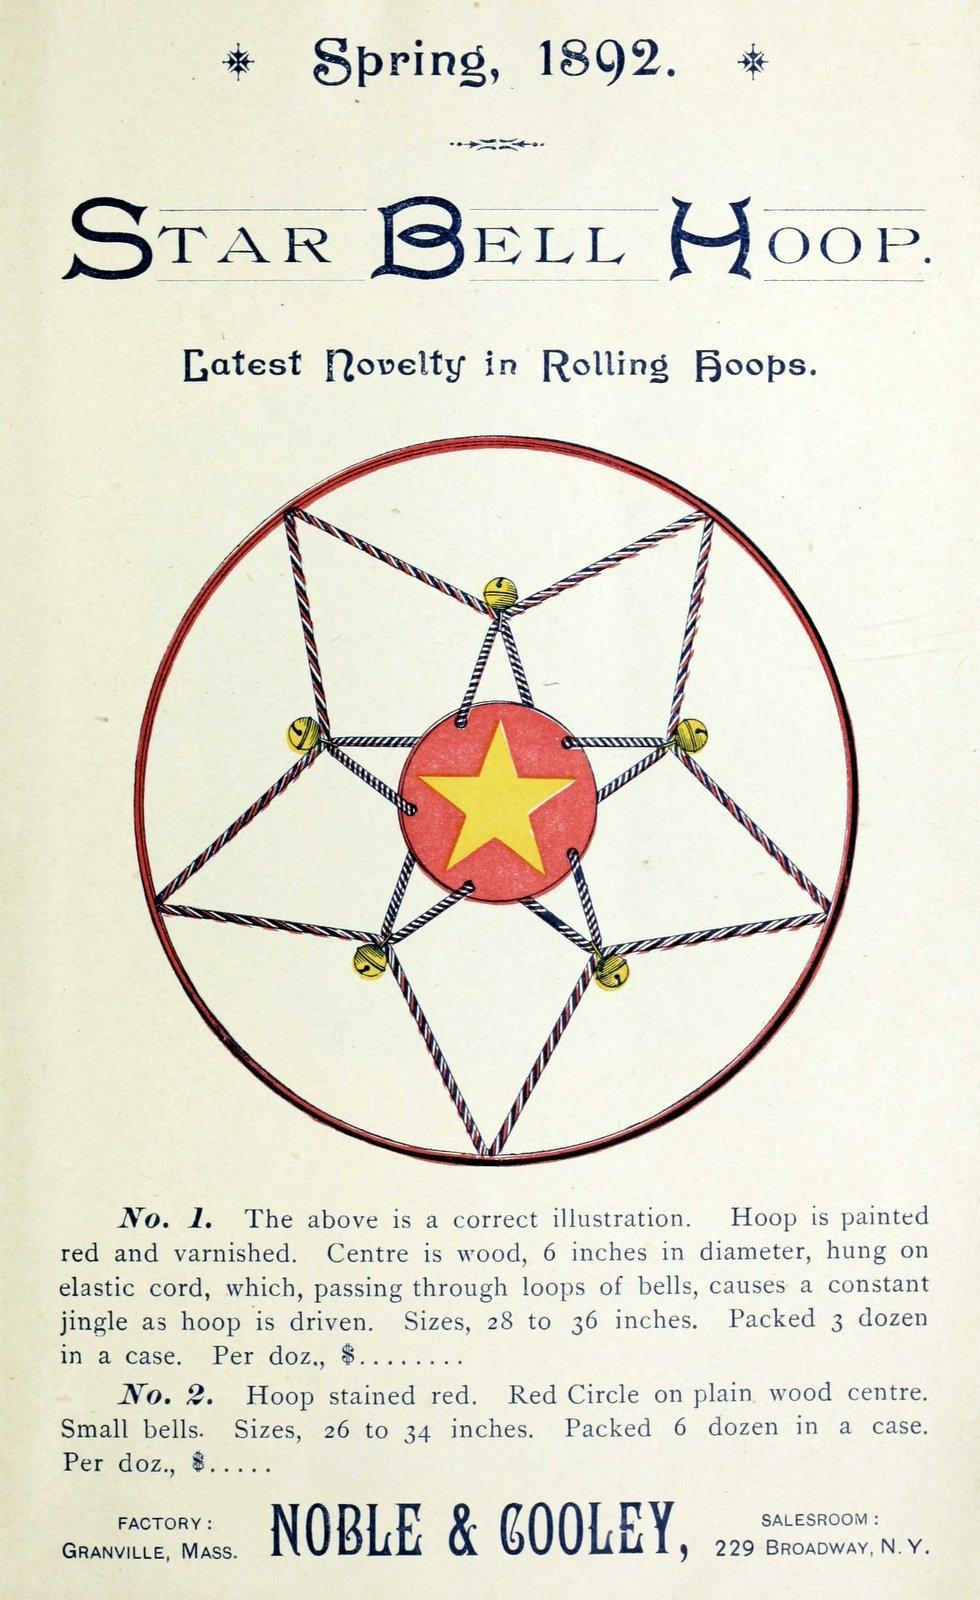 Antique toy from 1892 - Star Bell Hoop rolling hoop